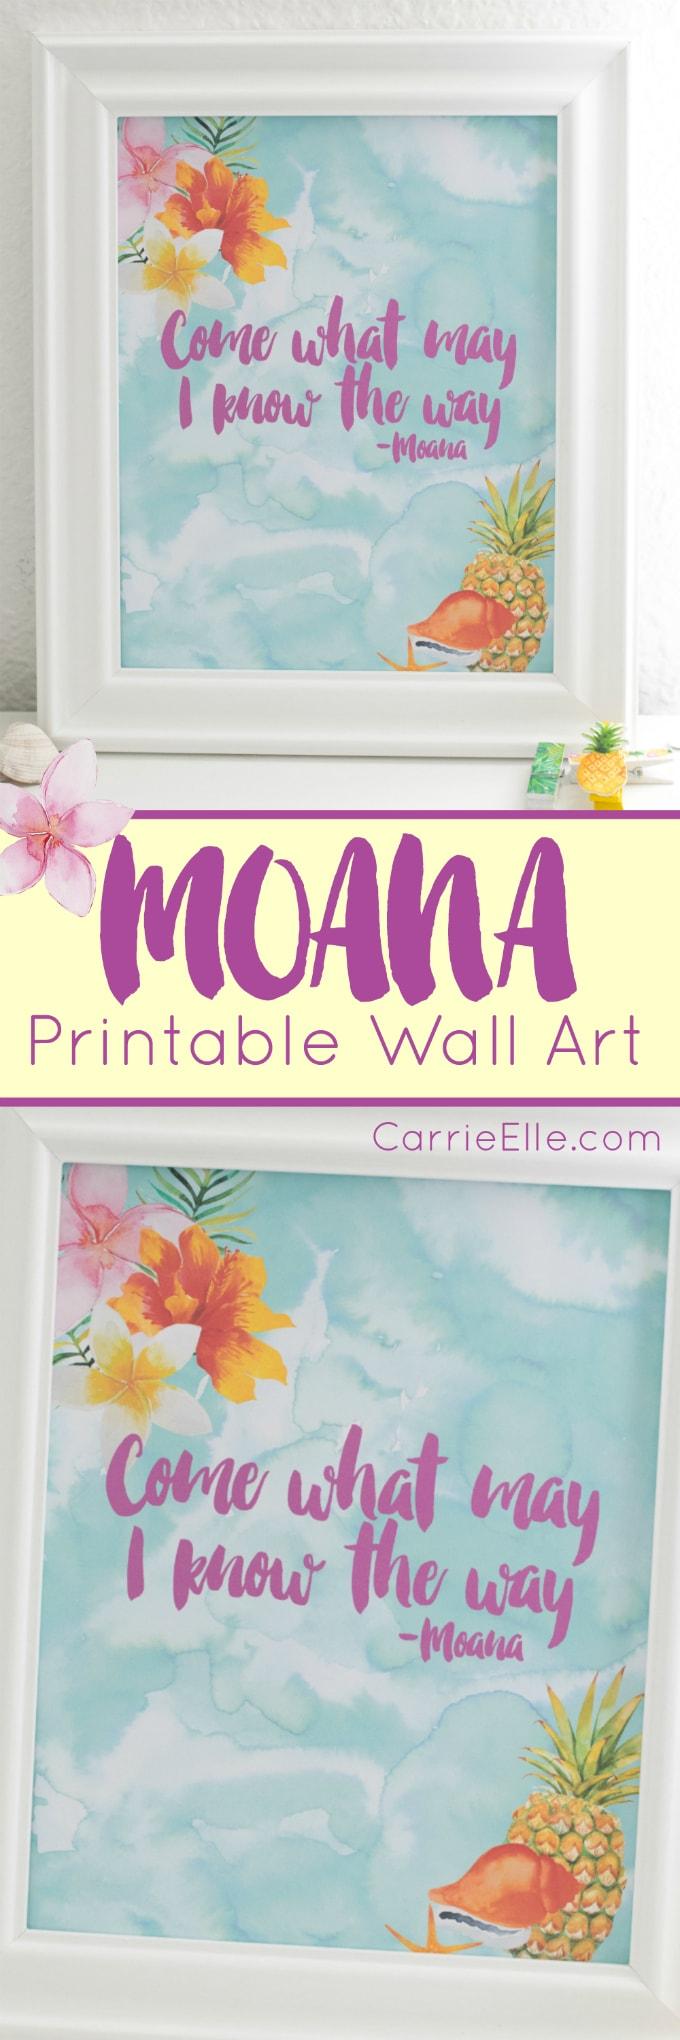 Moana Printable Wall Art